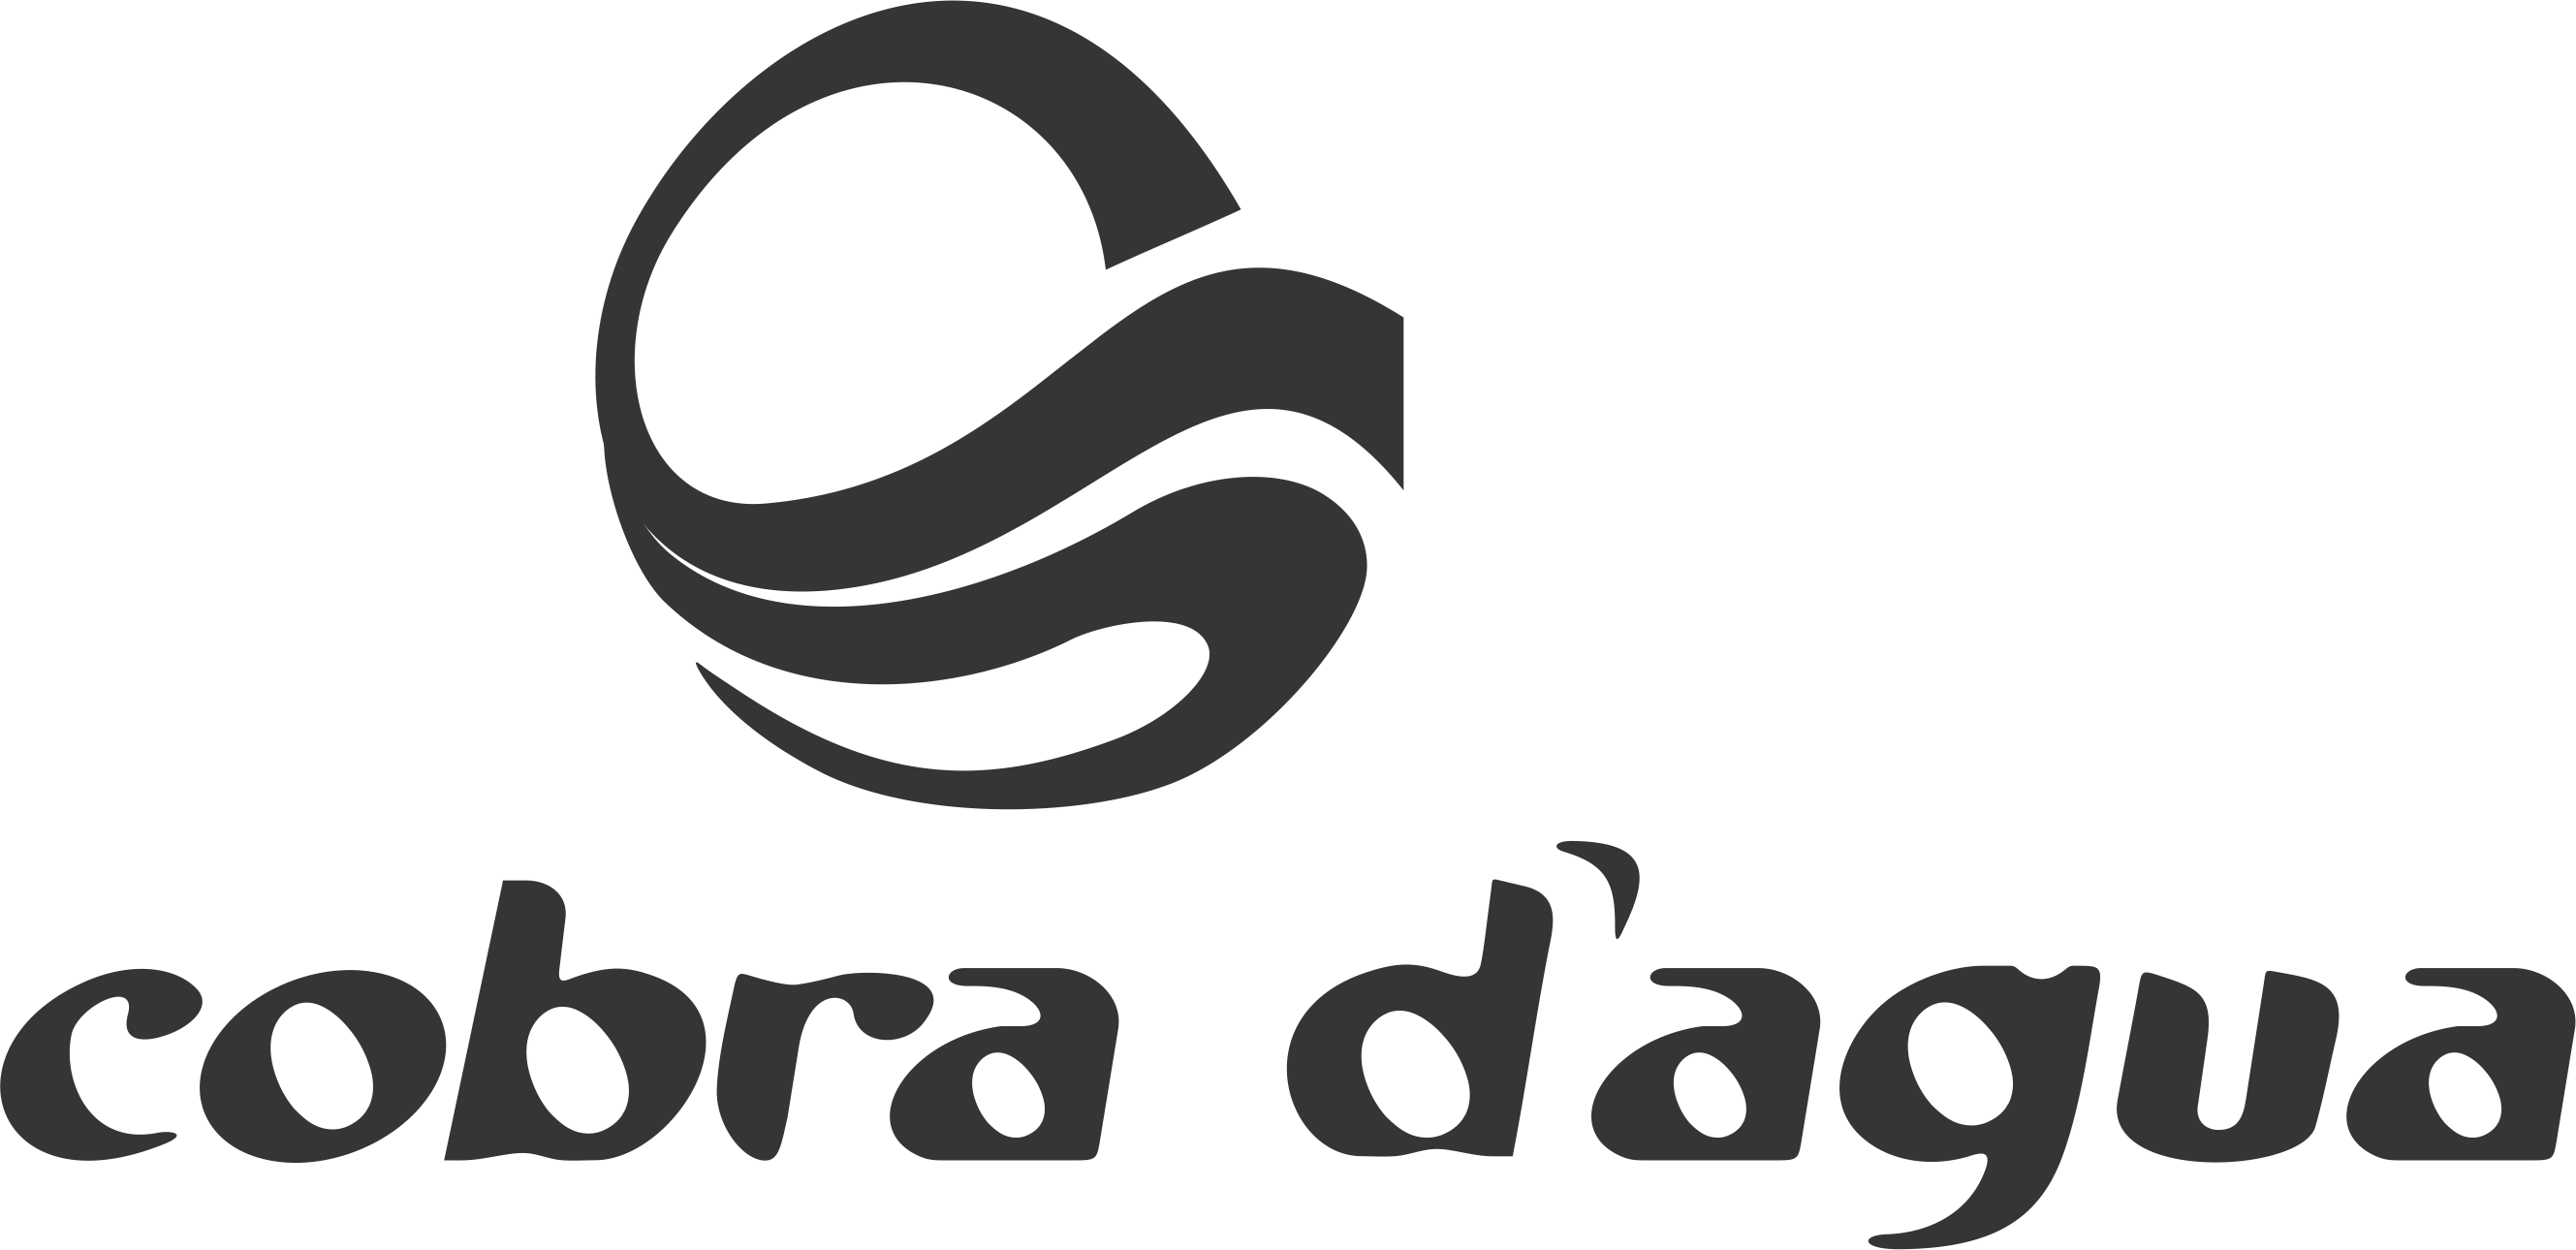 COBRA D'AGUA - Logo